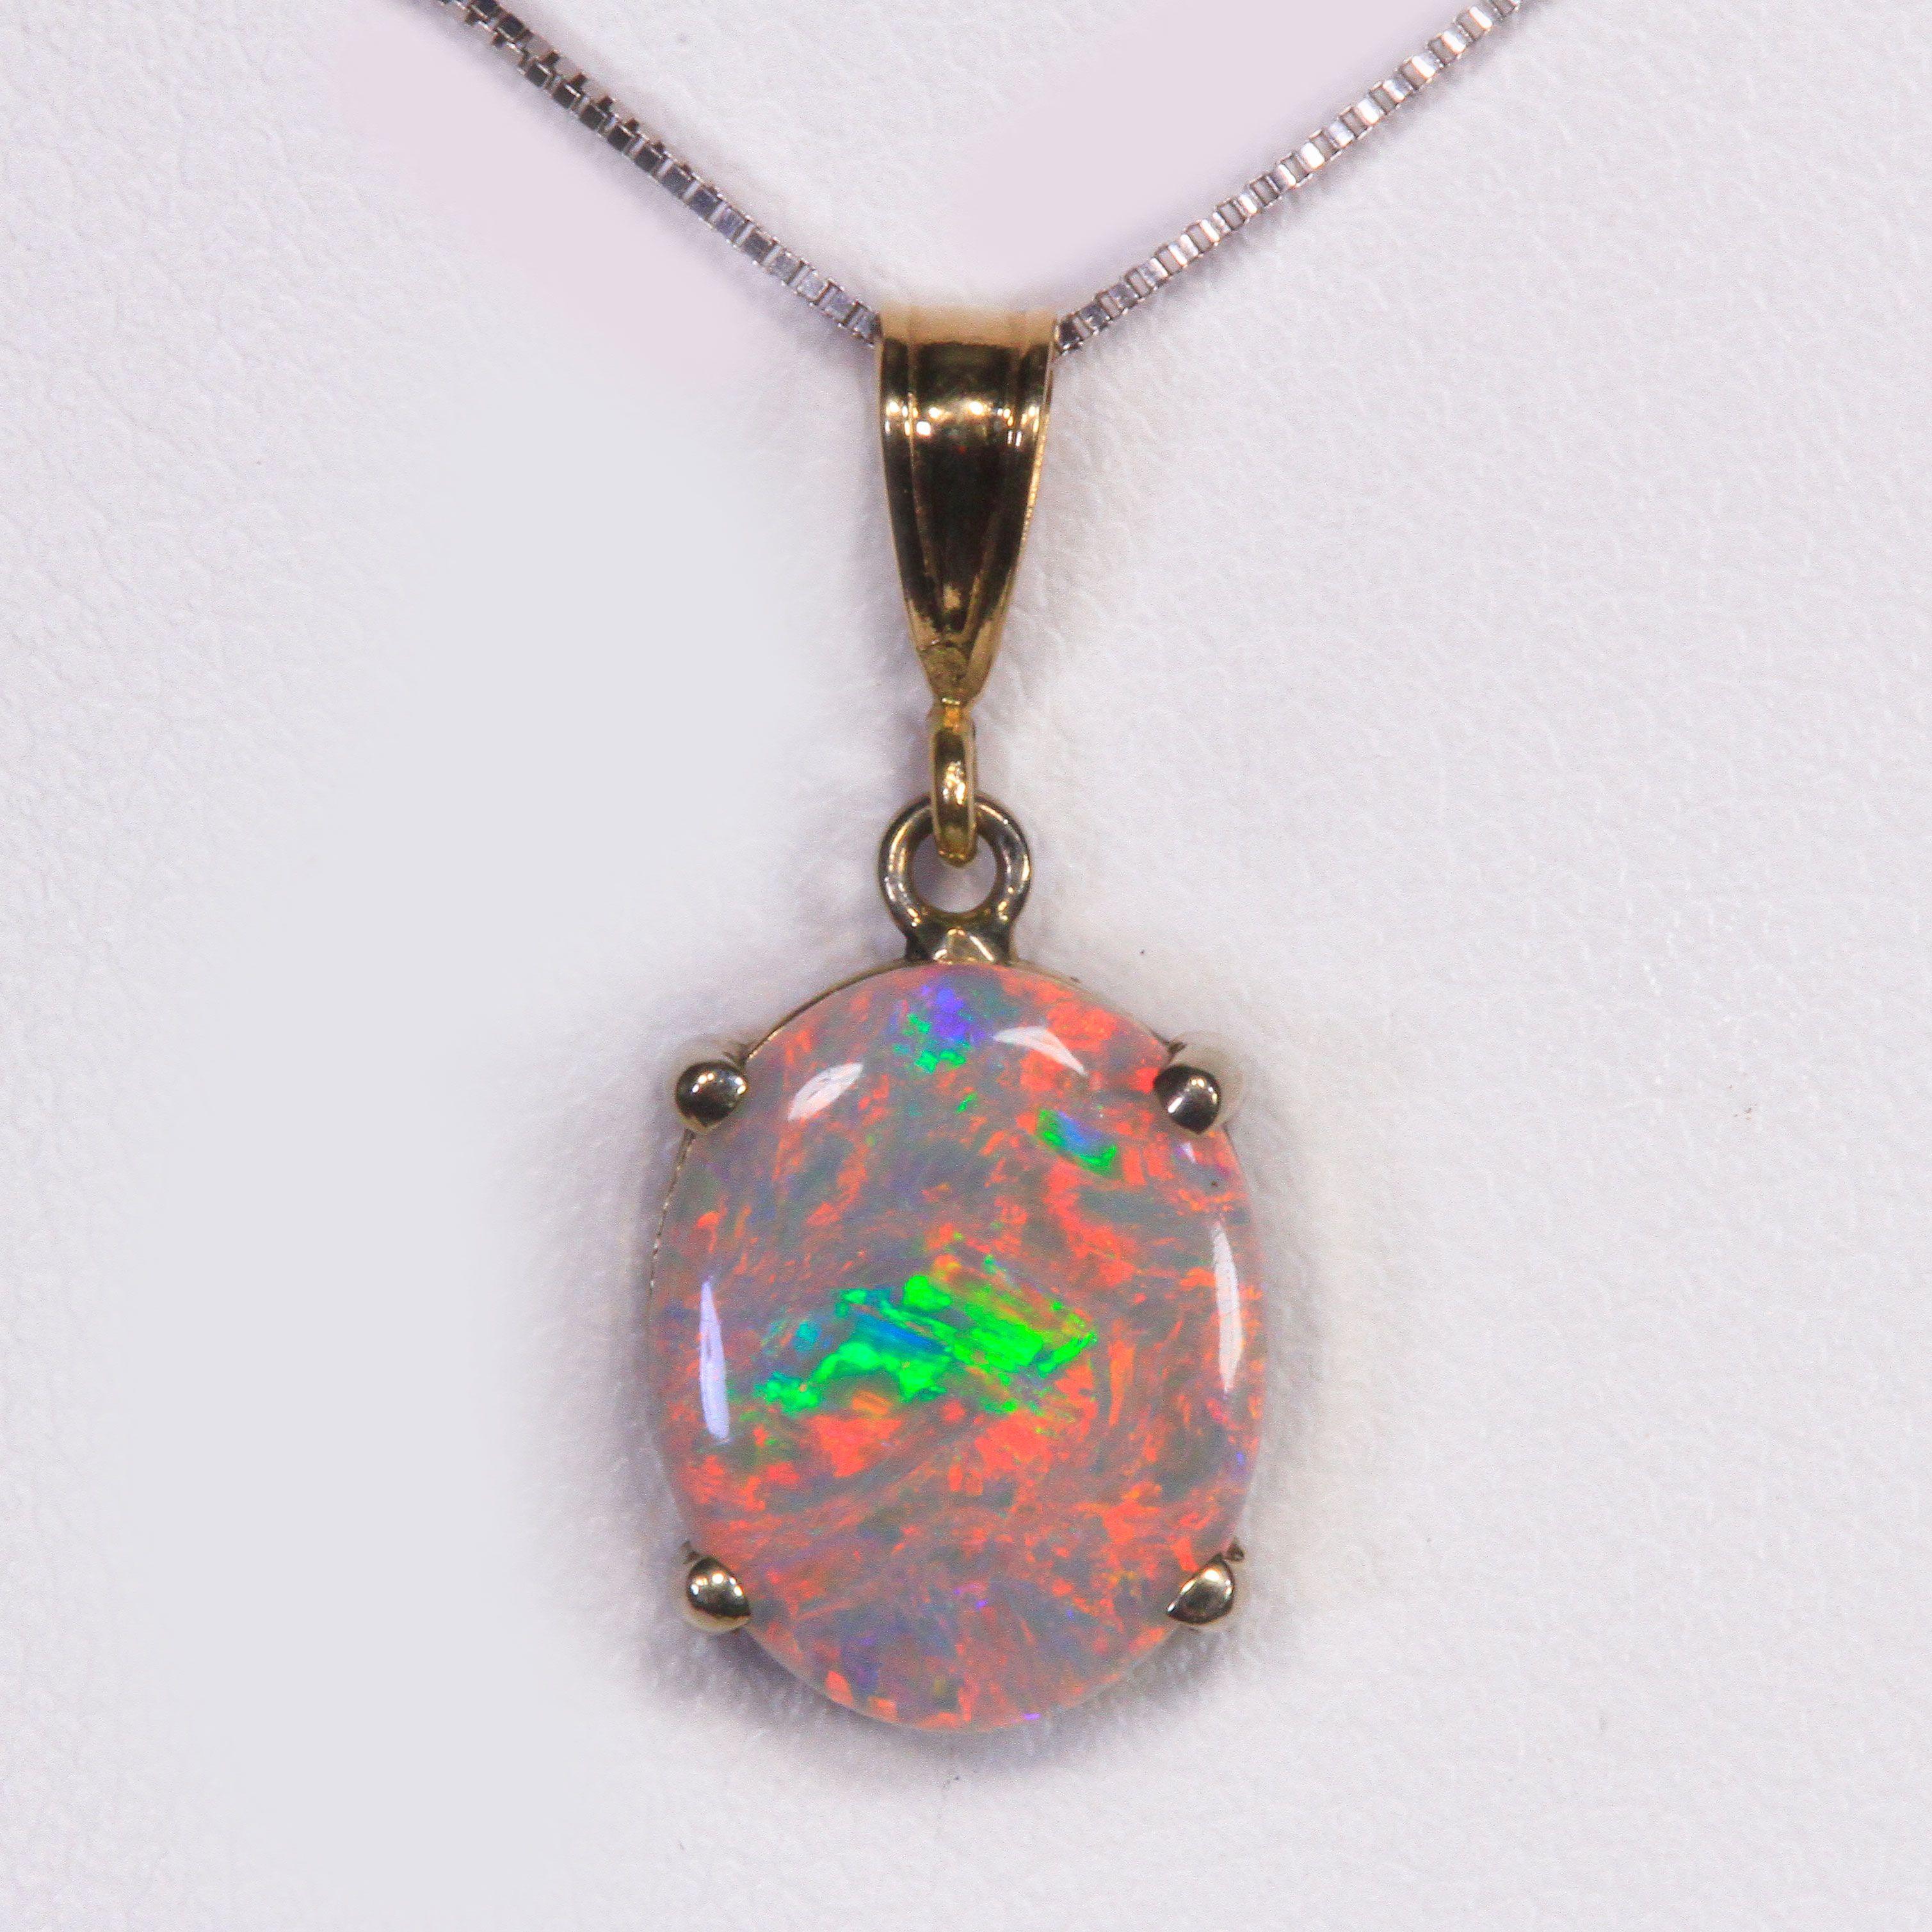 Australian opal pendant 215 carat pendants pinterest opals australian opal pendant 215 carat aloadofball Image collections